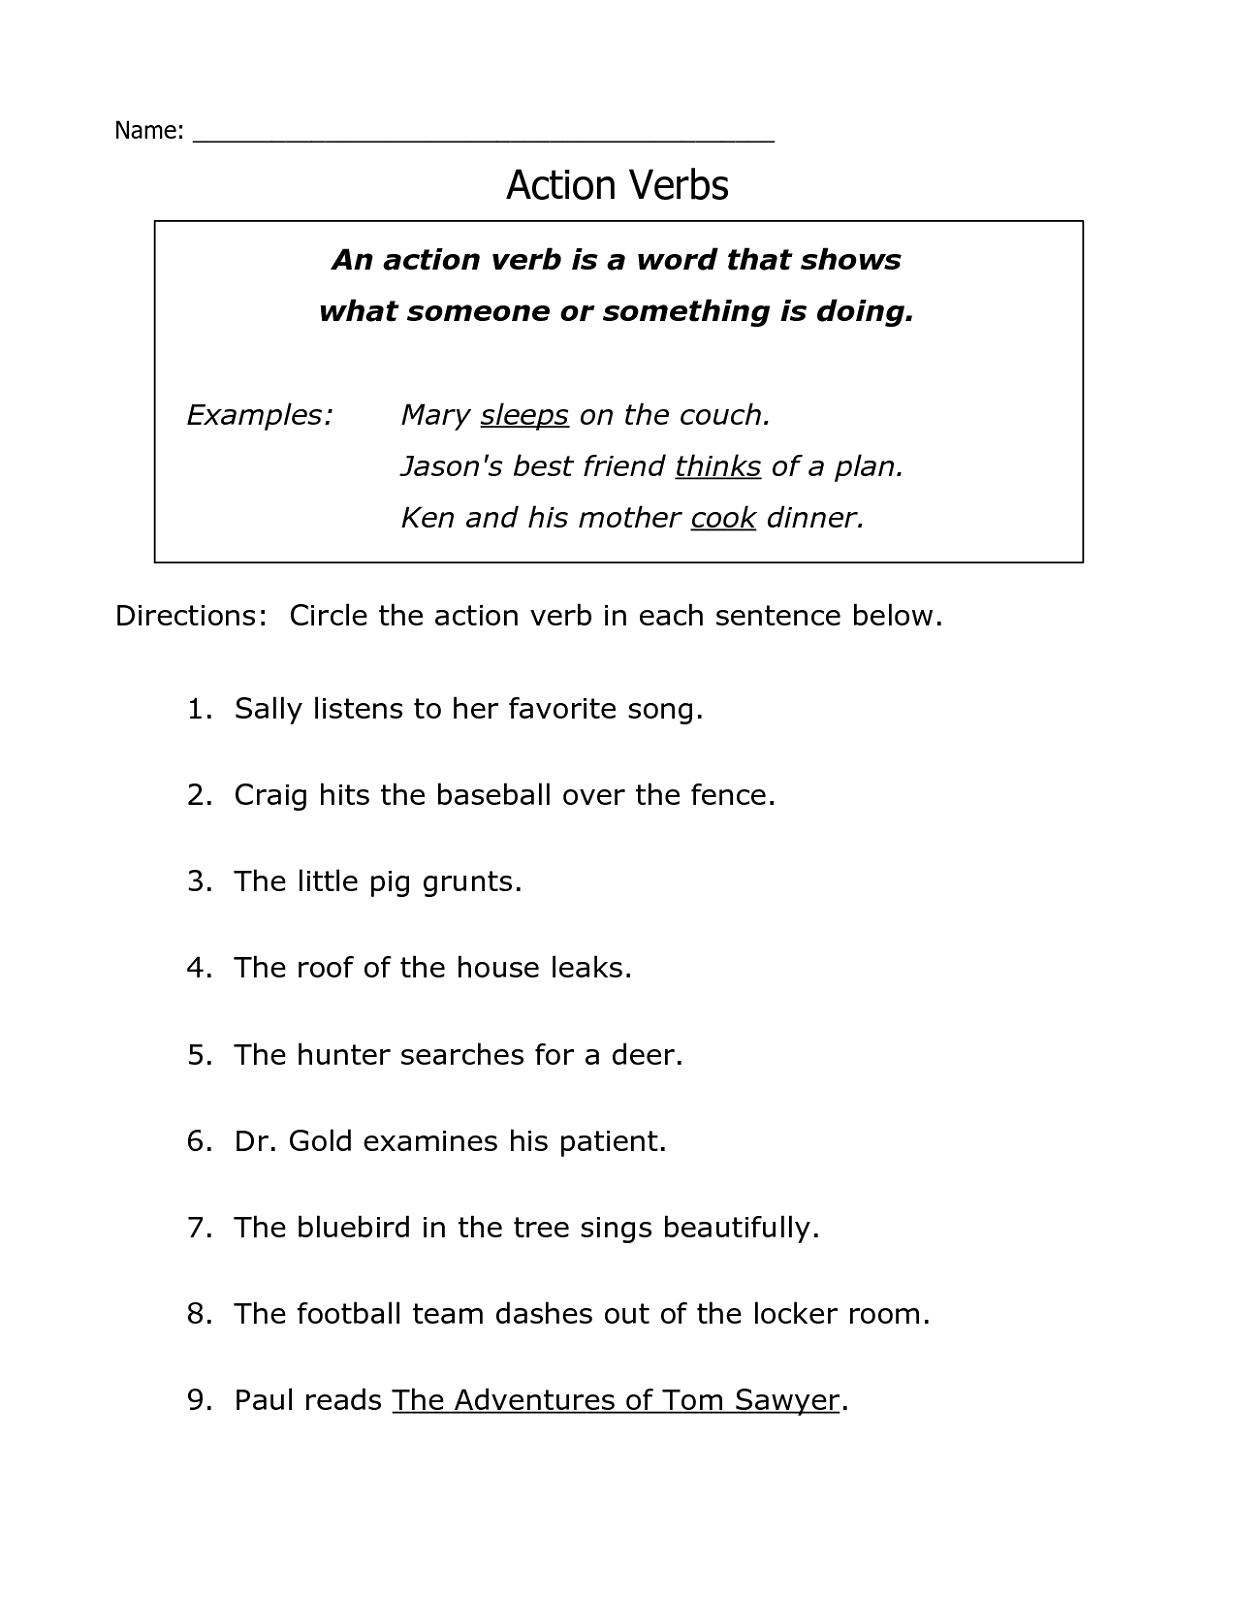 Free Printable Grammar Worksheets Action Verb | K5 Worksheets | Kids - Free Printable Grammar Worksheets For 2Nd Grade